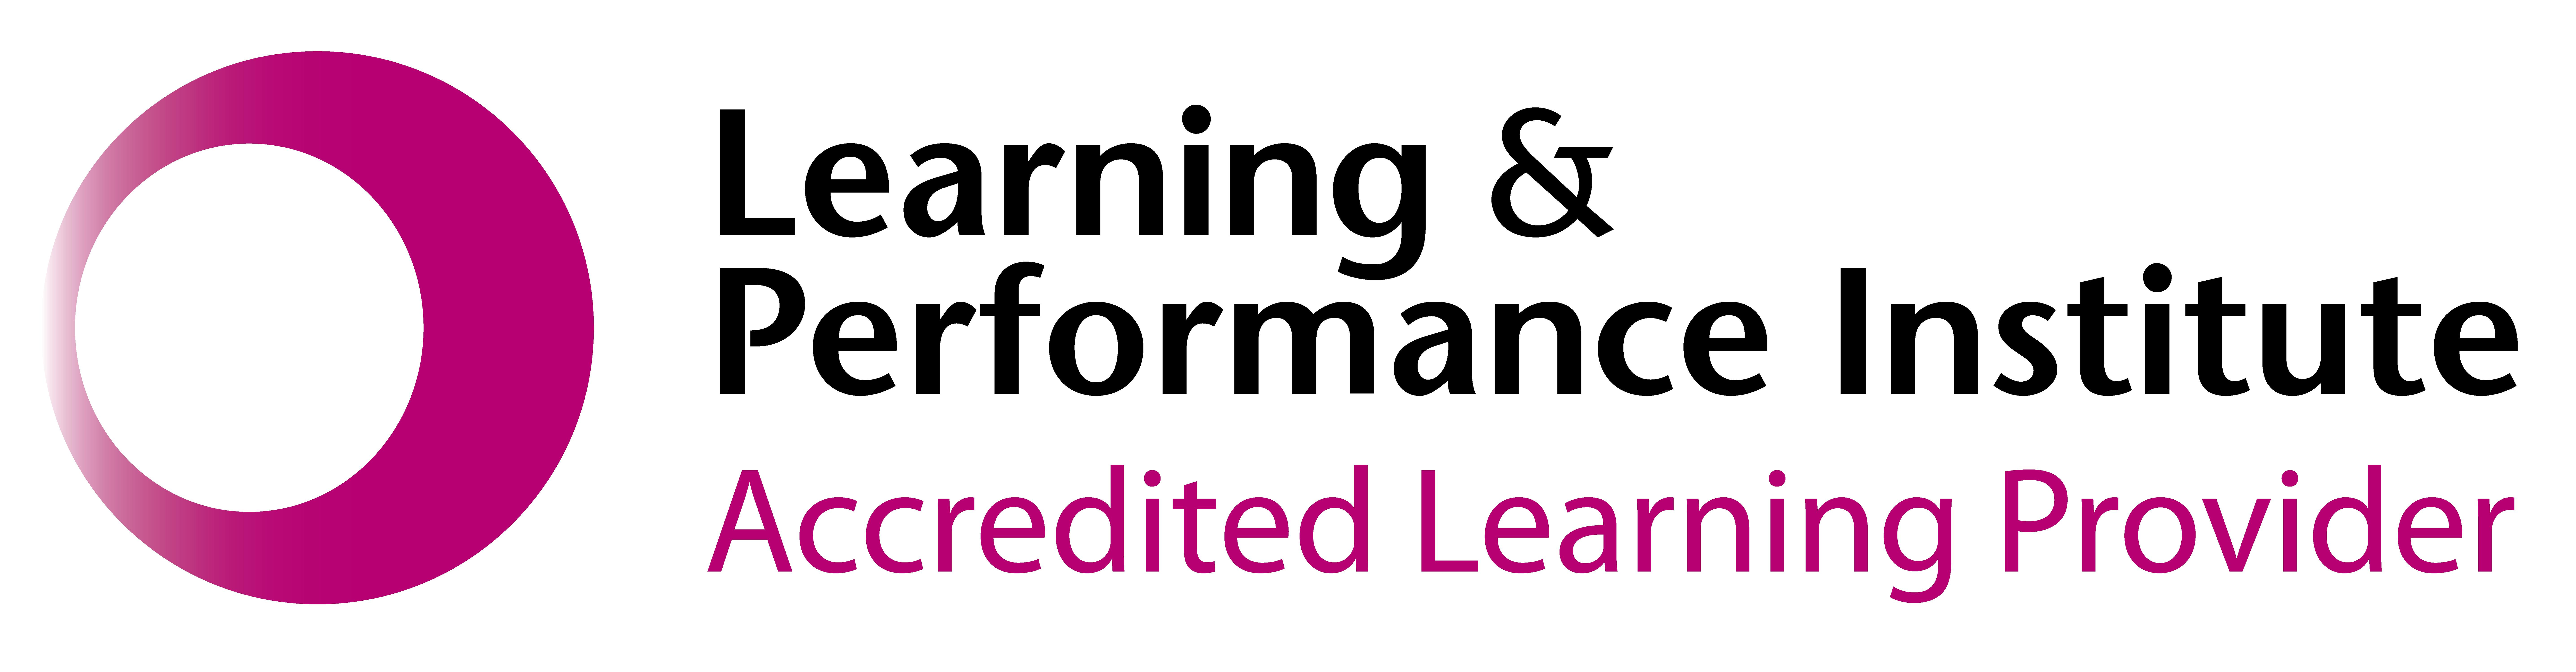 LPI logo@4x